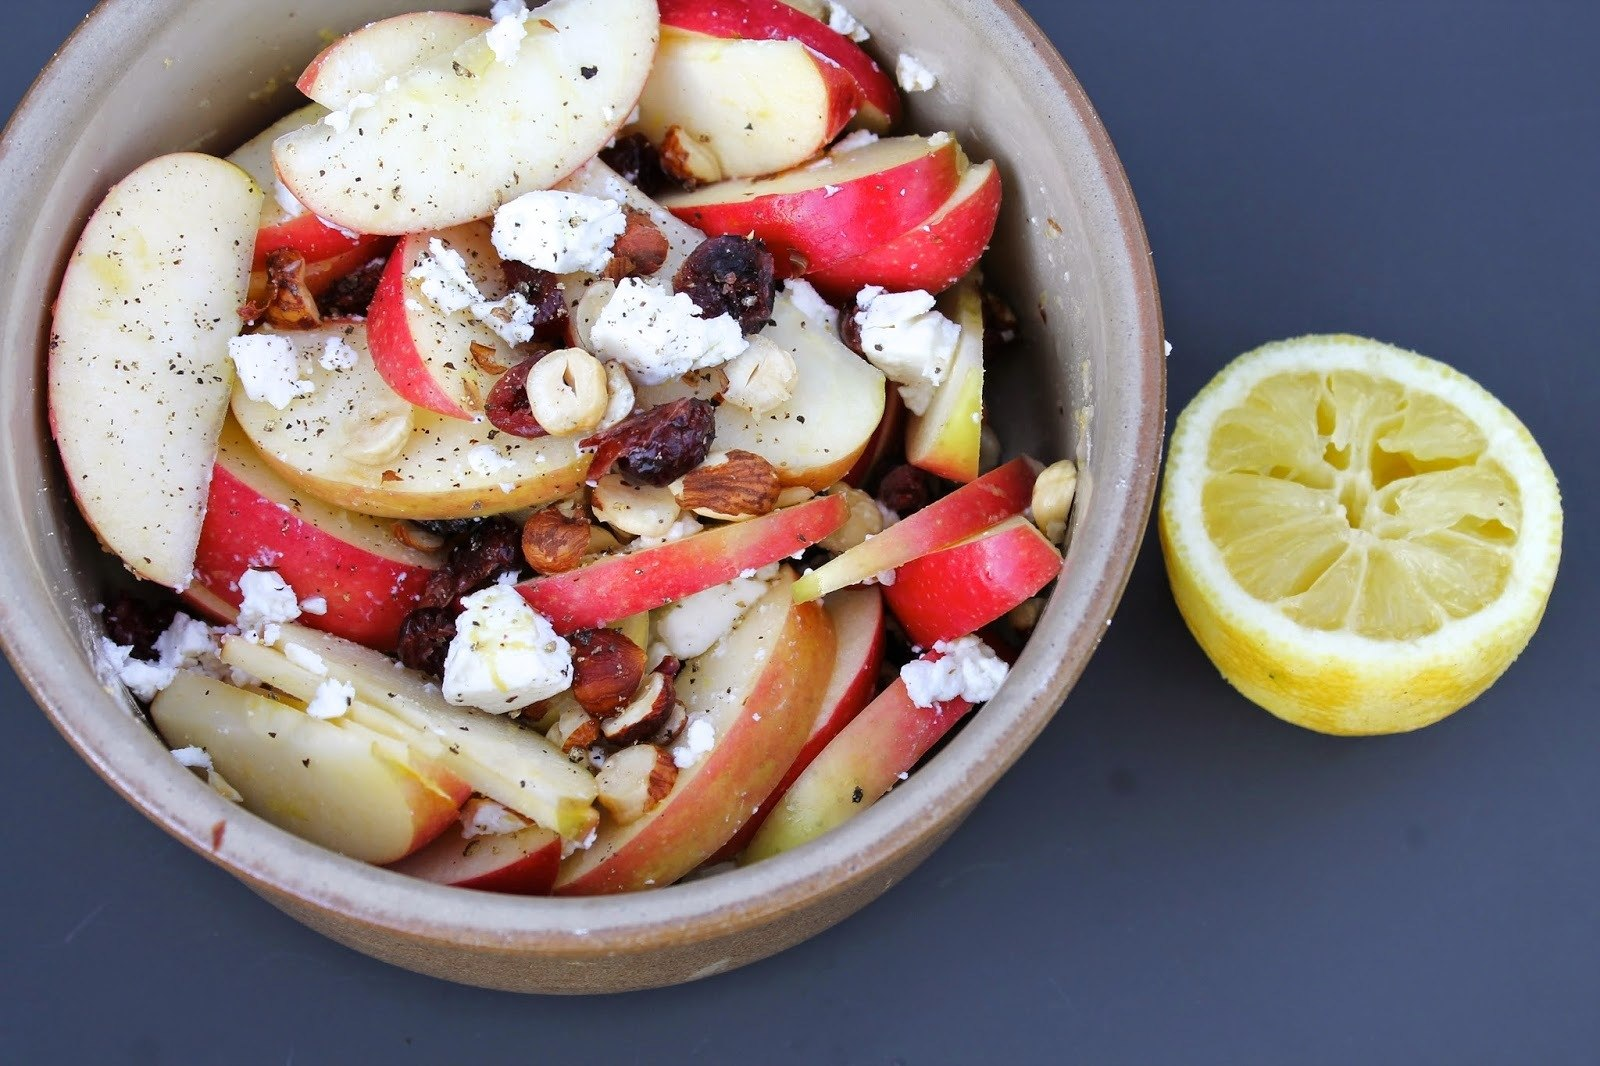 Æblesalat med feta, hasselnødder og citron